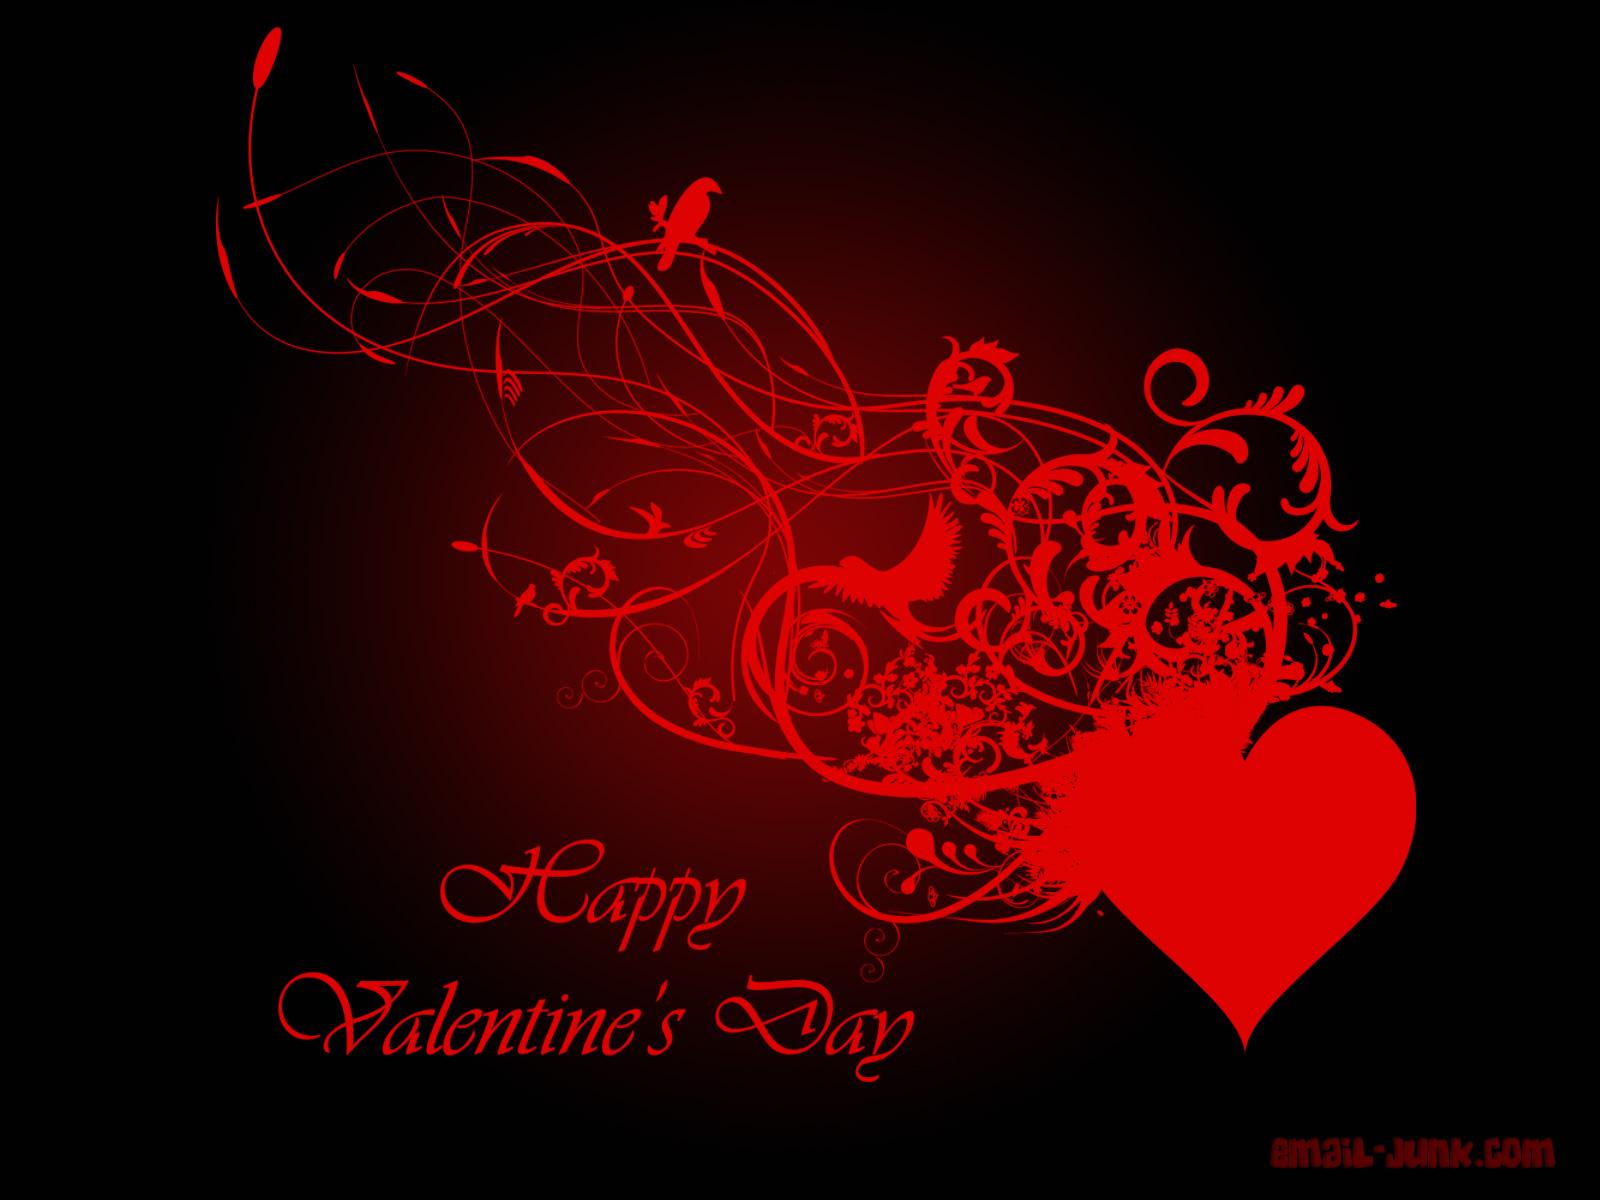 Happy Valentines Day Best HD Wallpaper 12080 1600x1200